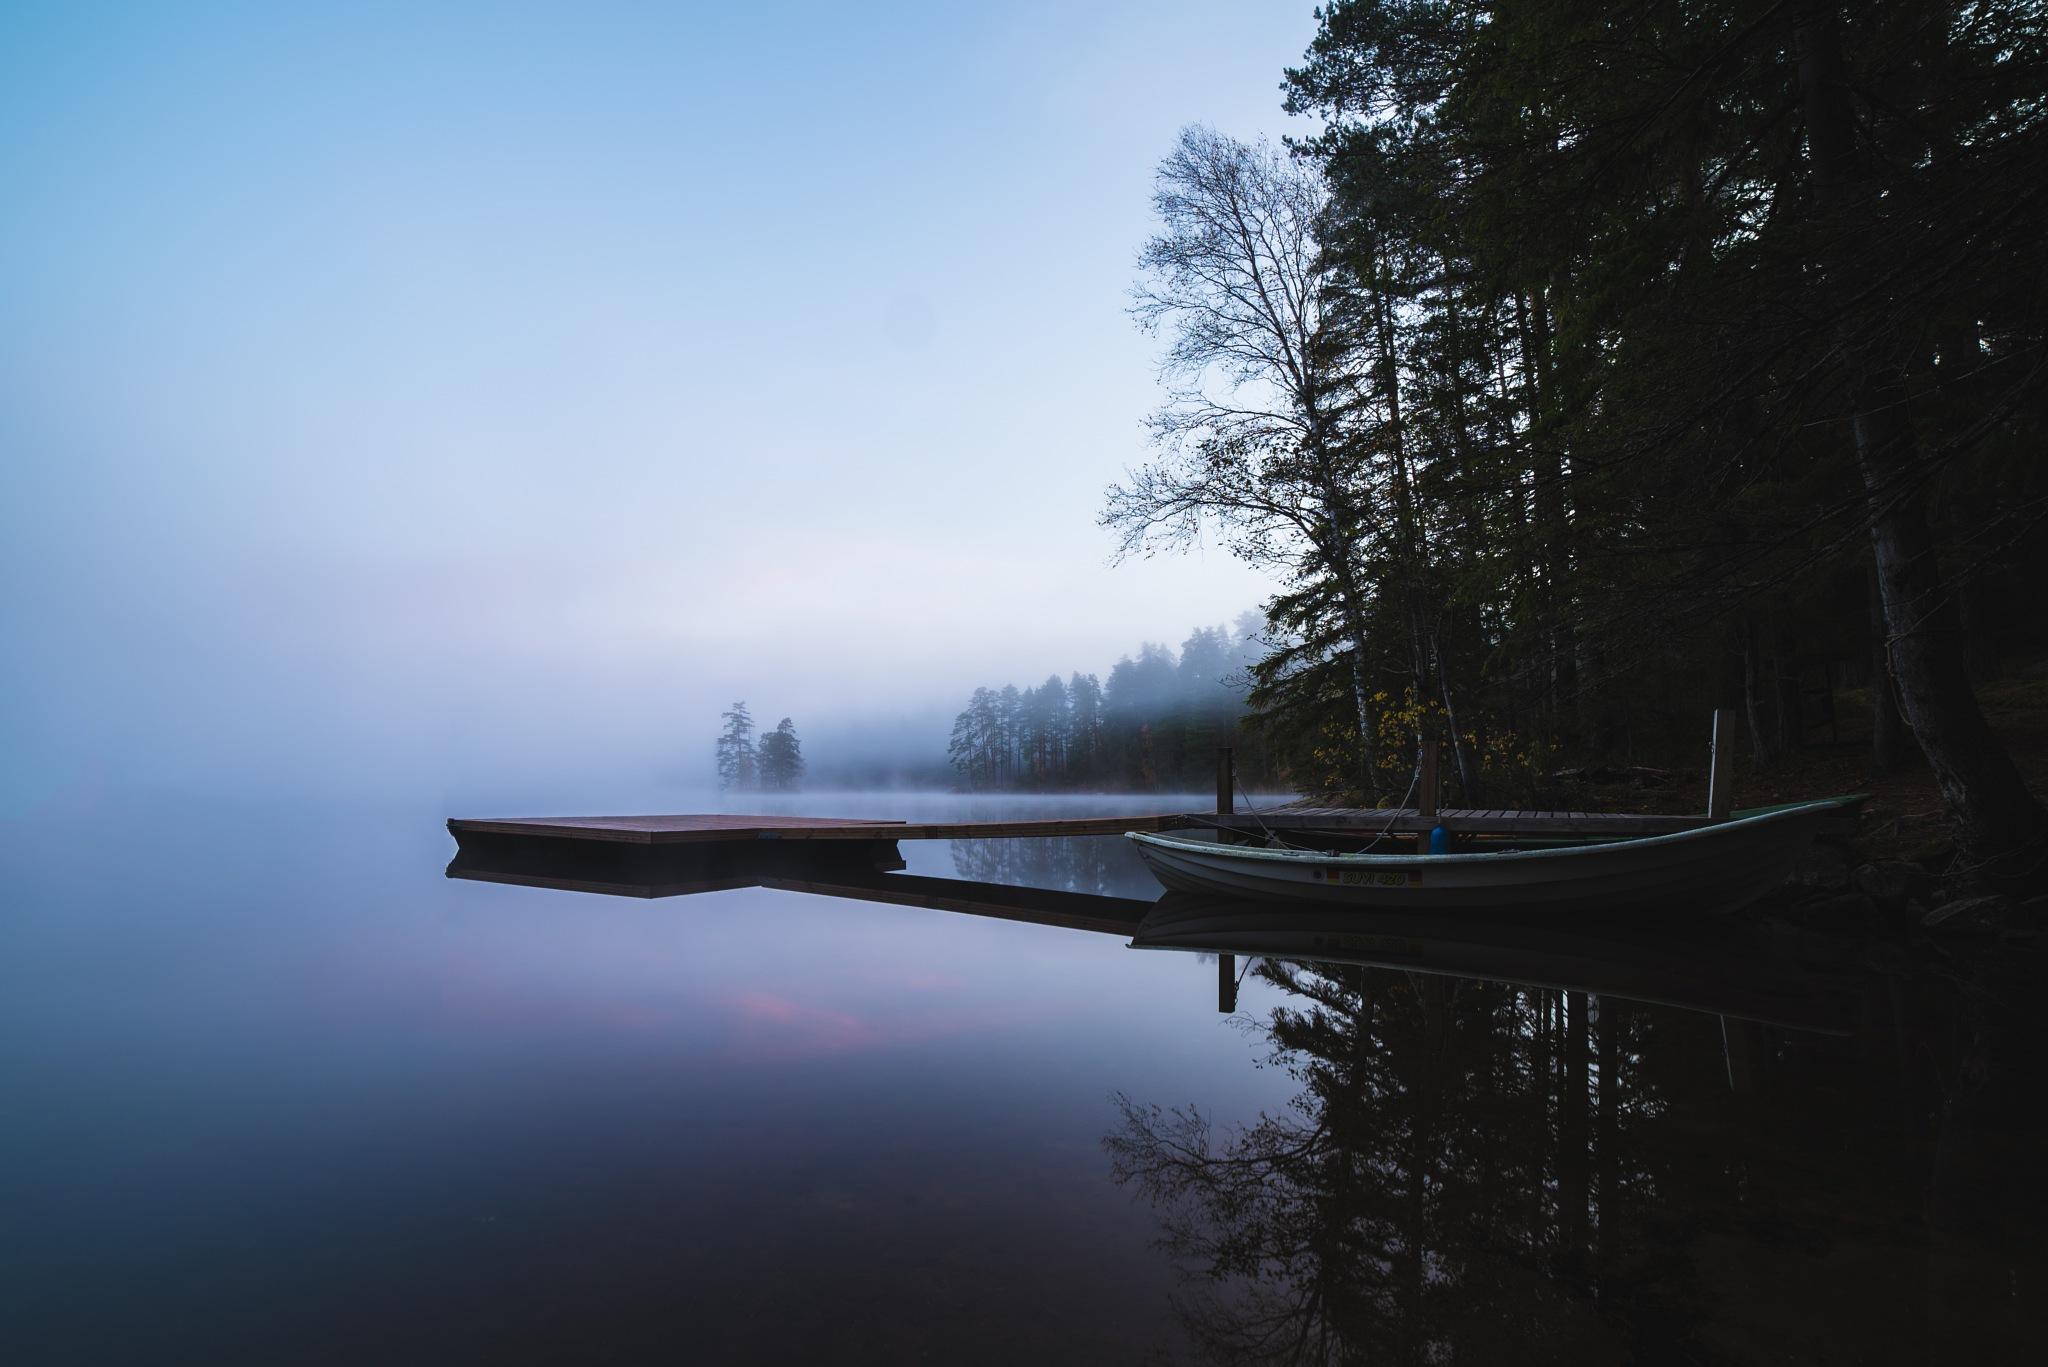 Morning Mystery by Matti